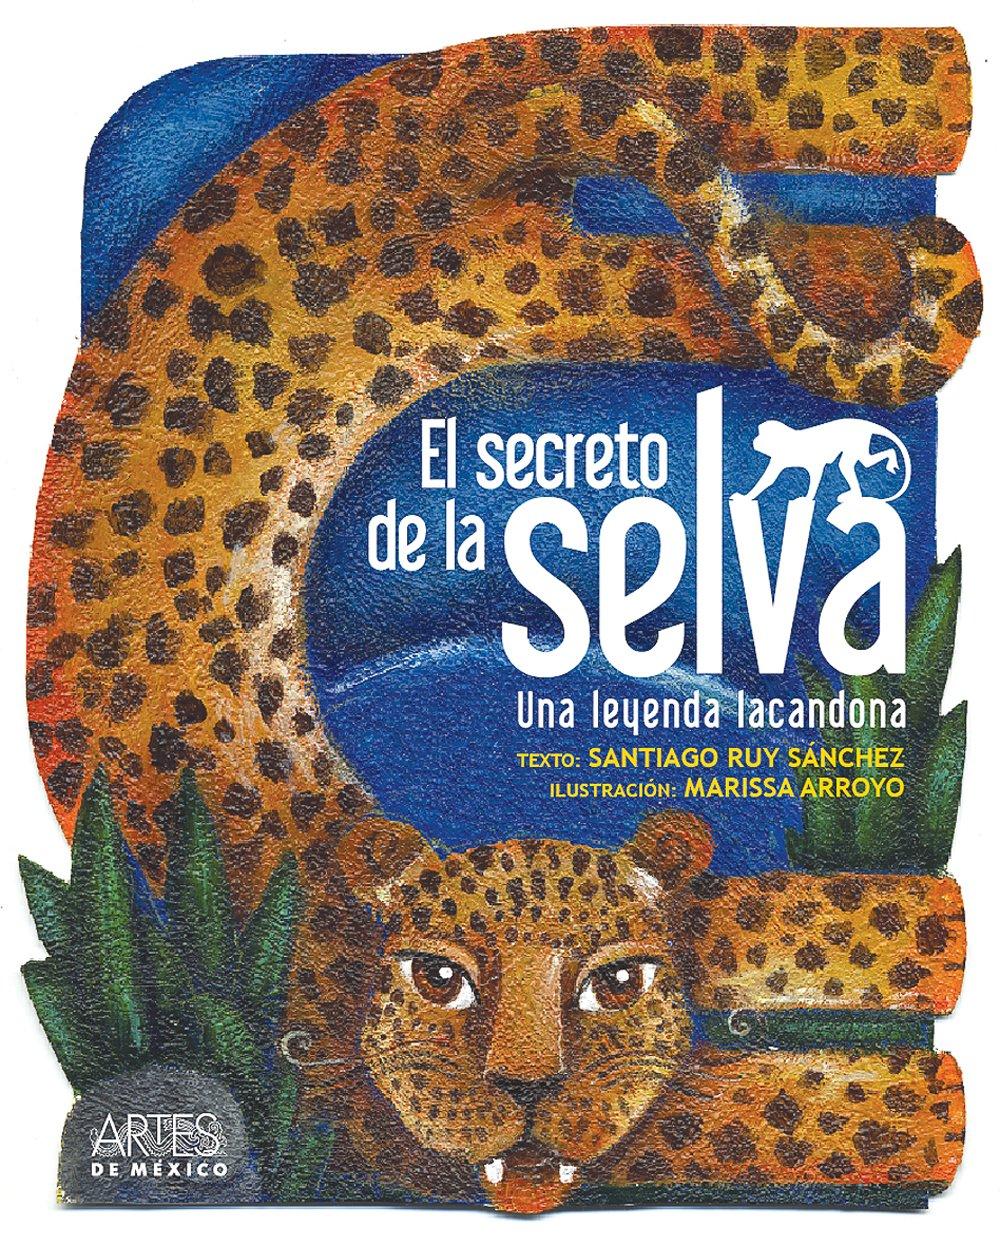 Download El secreto de la selva / The Secret Of The Forest: Una leyenda Lacandona / A Lacandona's Legend (Spanish Edition) pdf epub